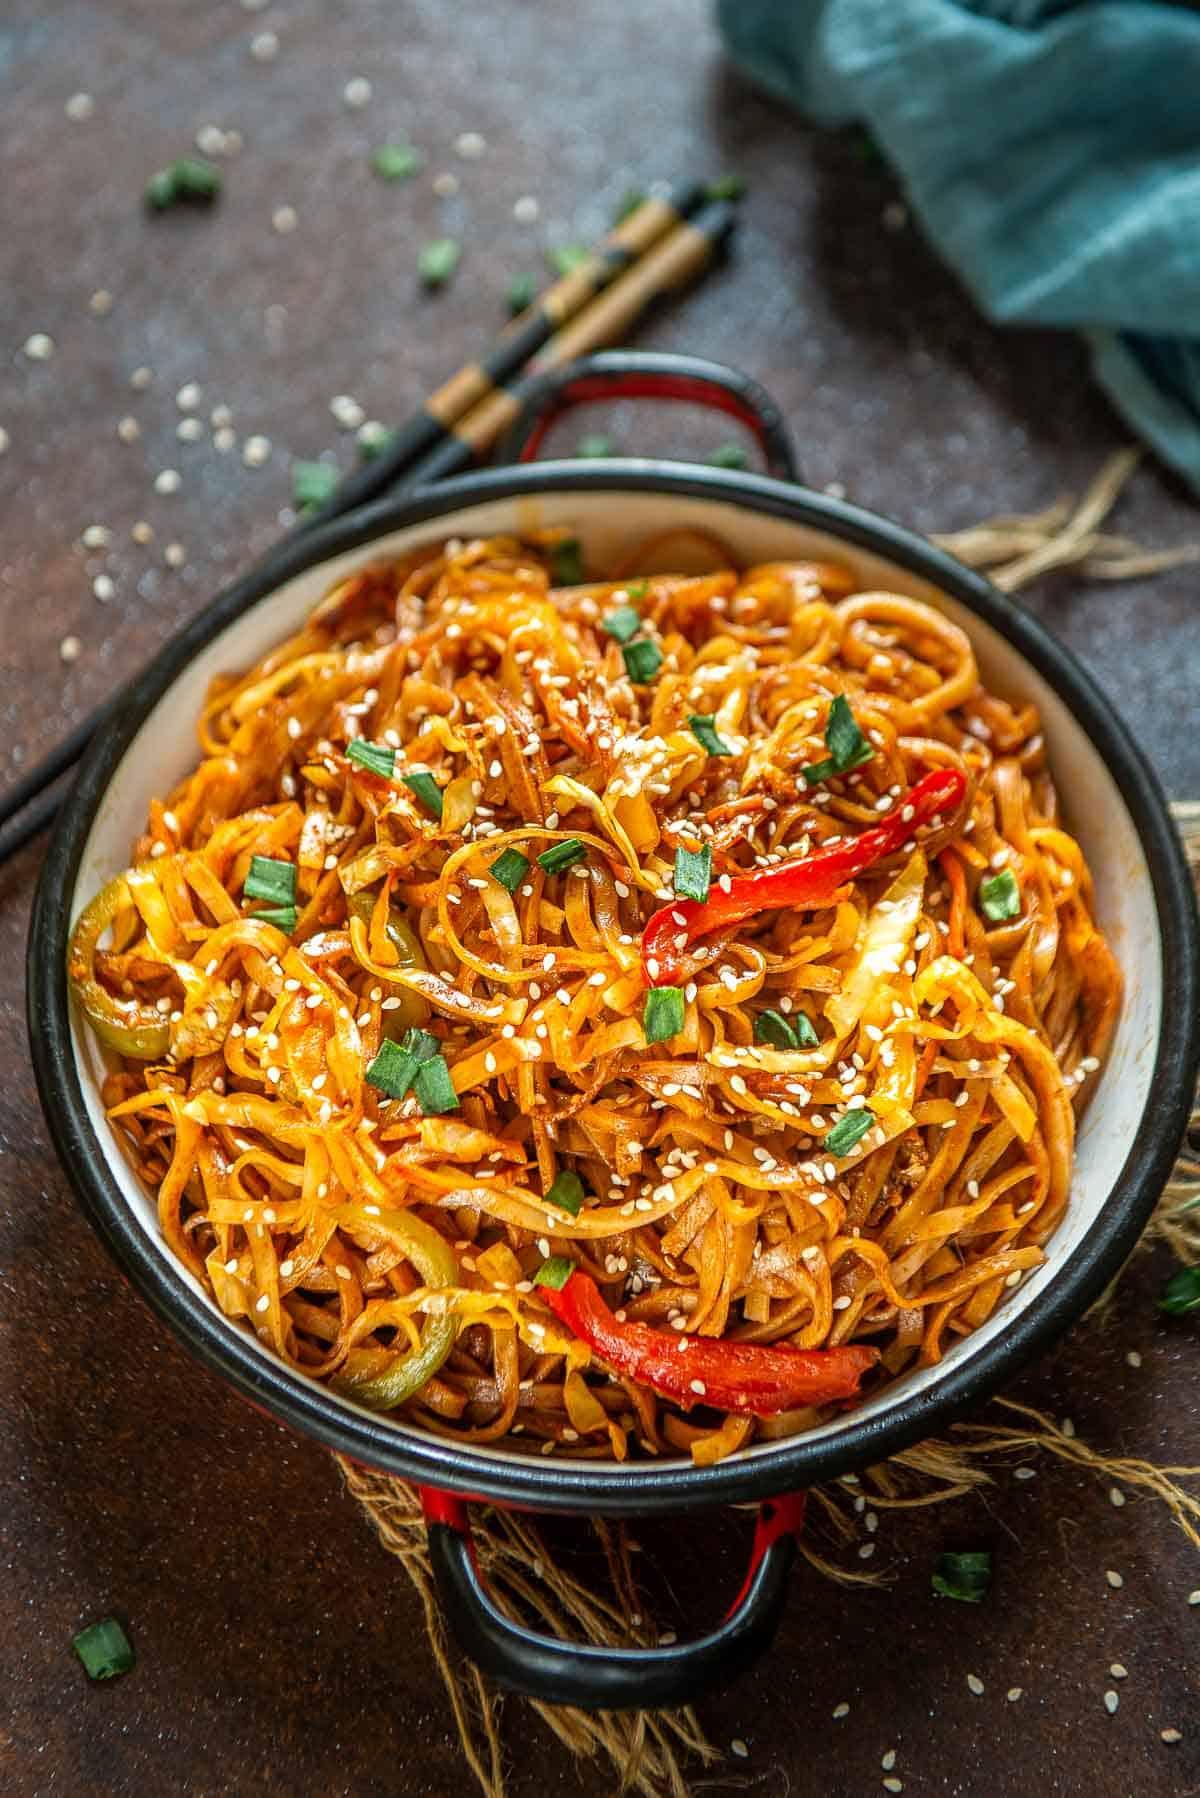 Gochujang noodles served in a bowl.